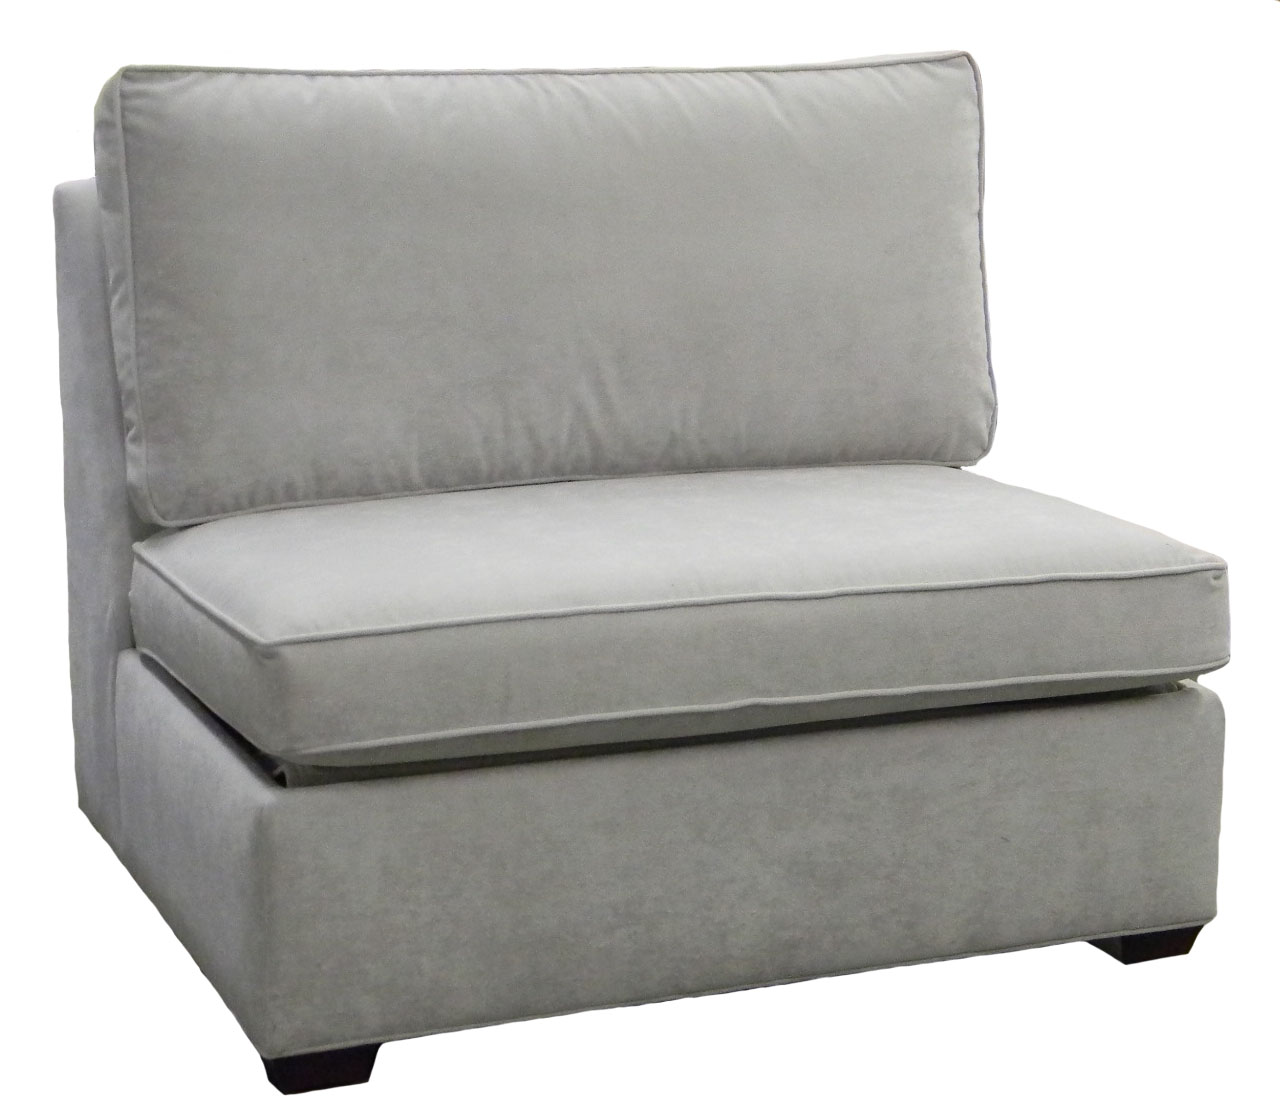 Crawford Sectional Armless Single Sleeper Sofa Carolina